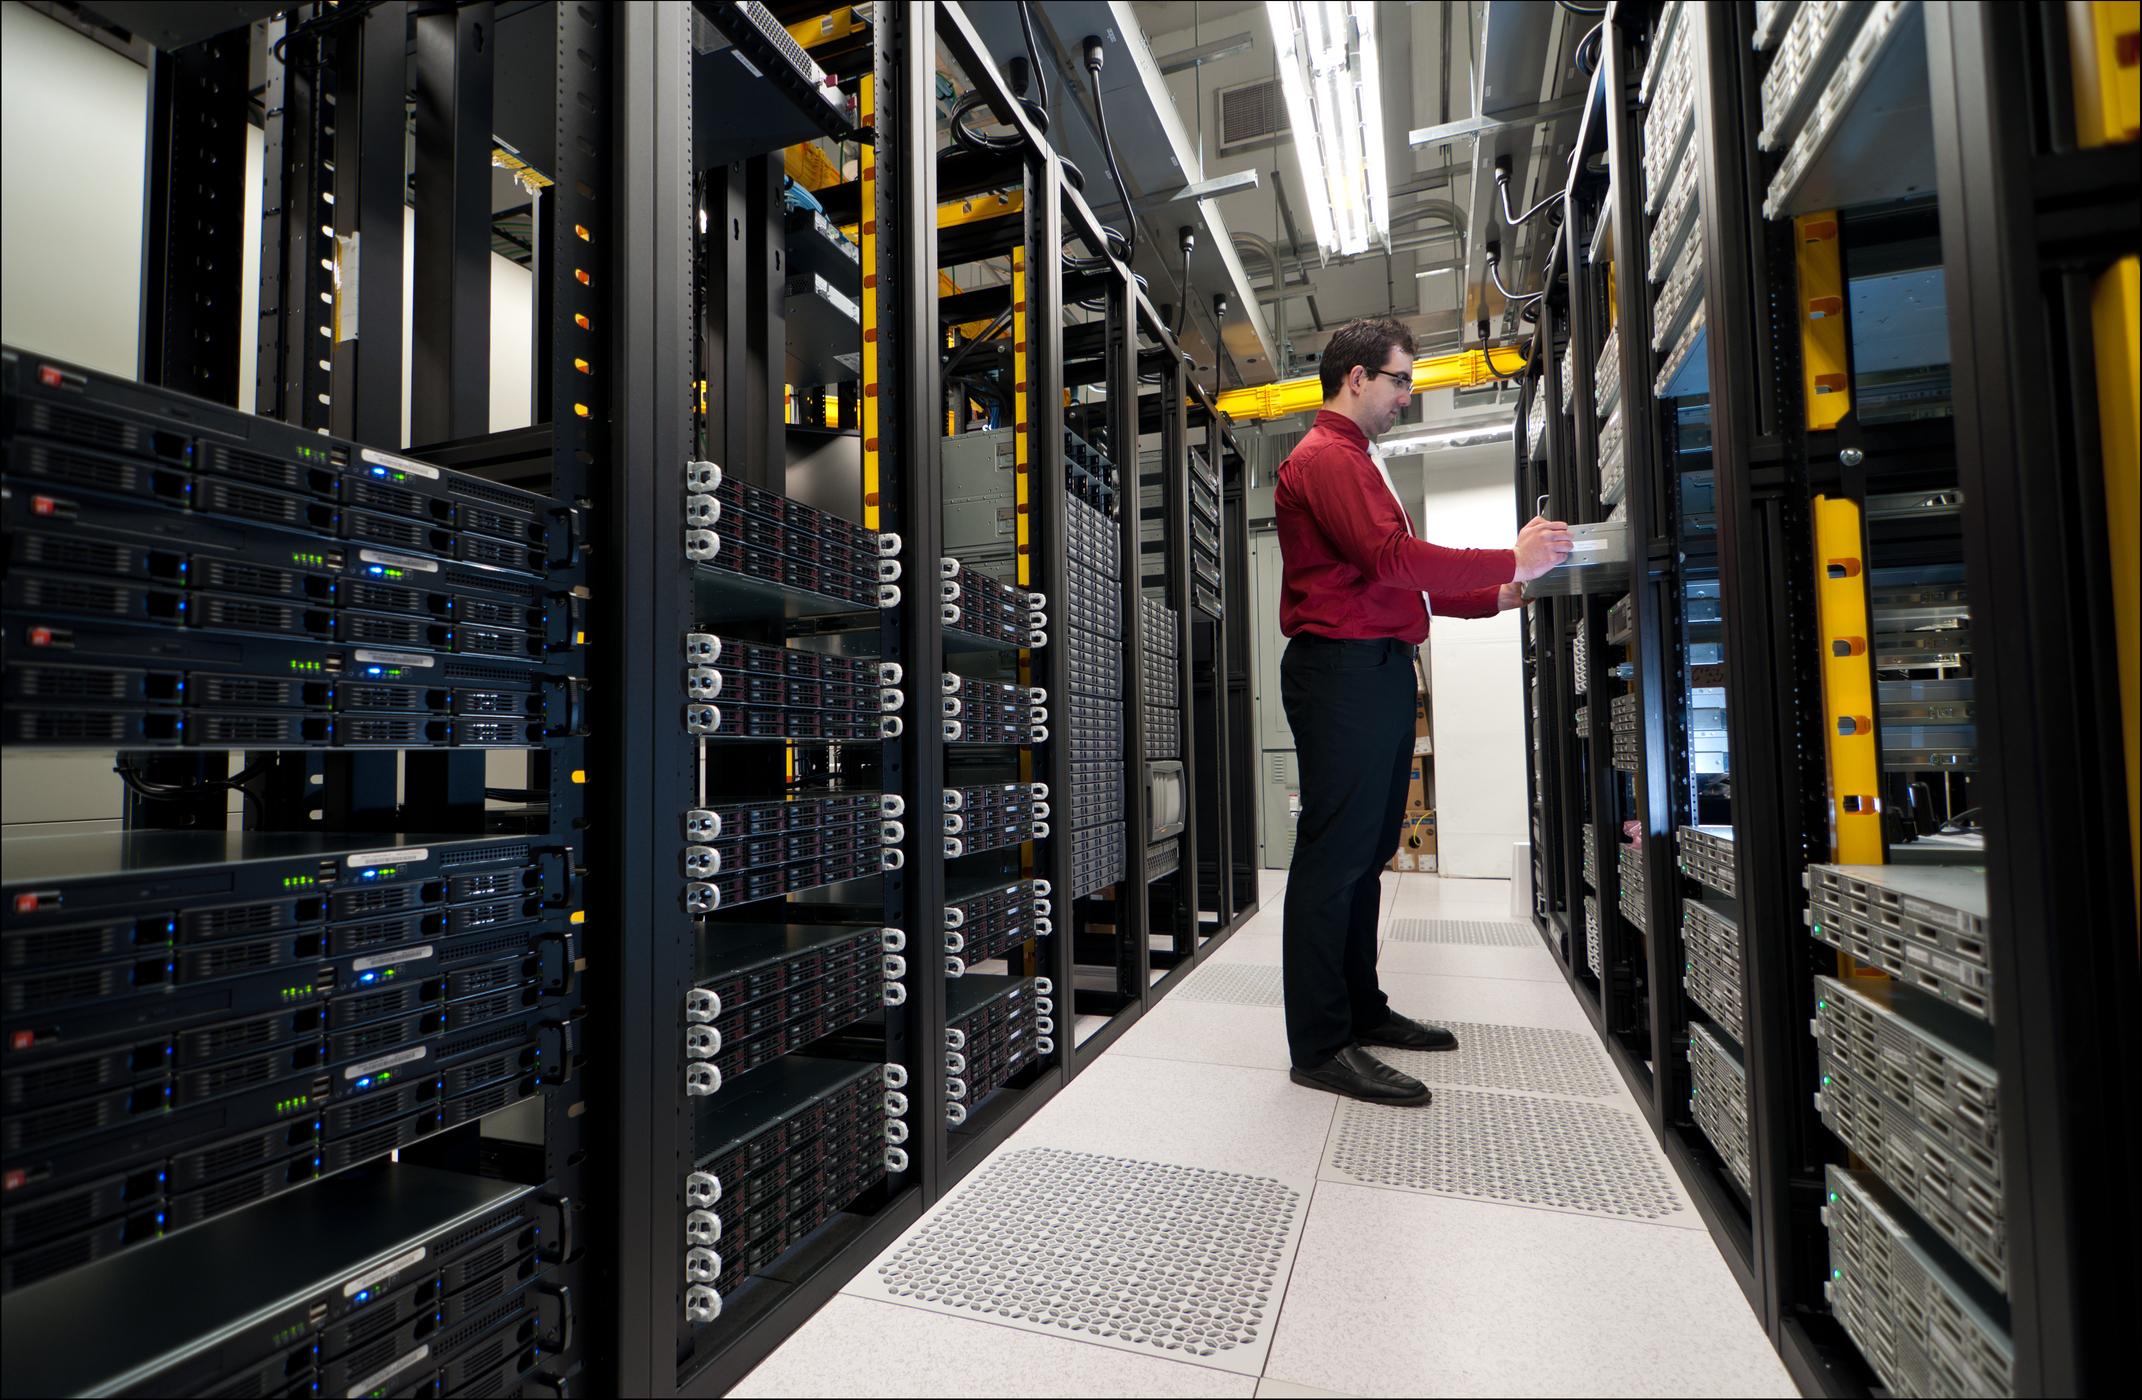 storageswiss.com - George Crump - How to Make Storage Consolidation Work in the Modern Data Center